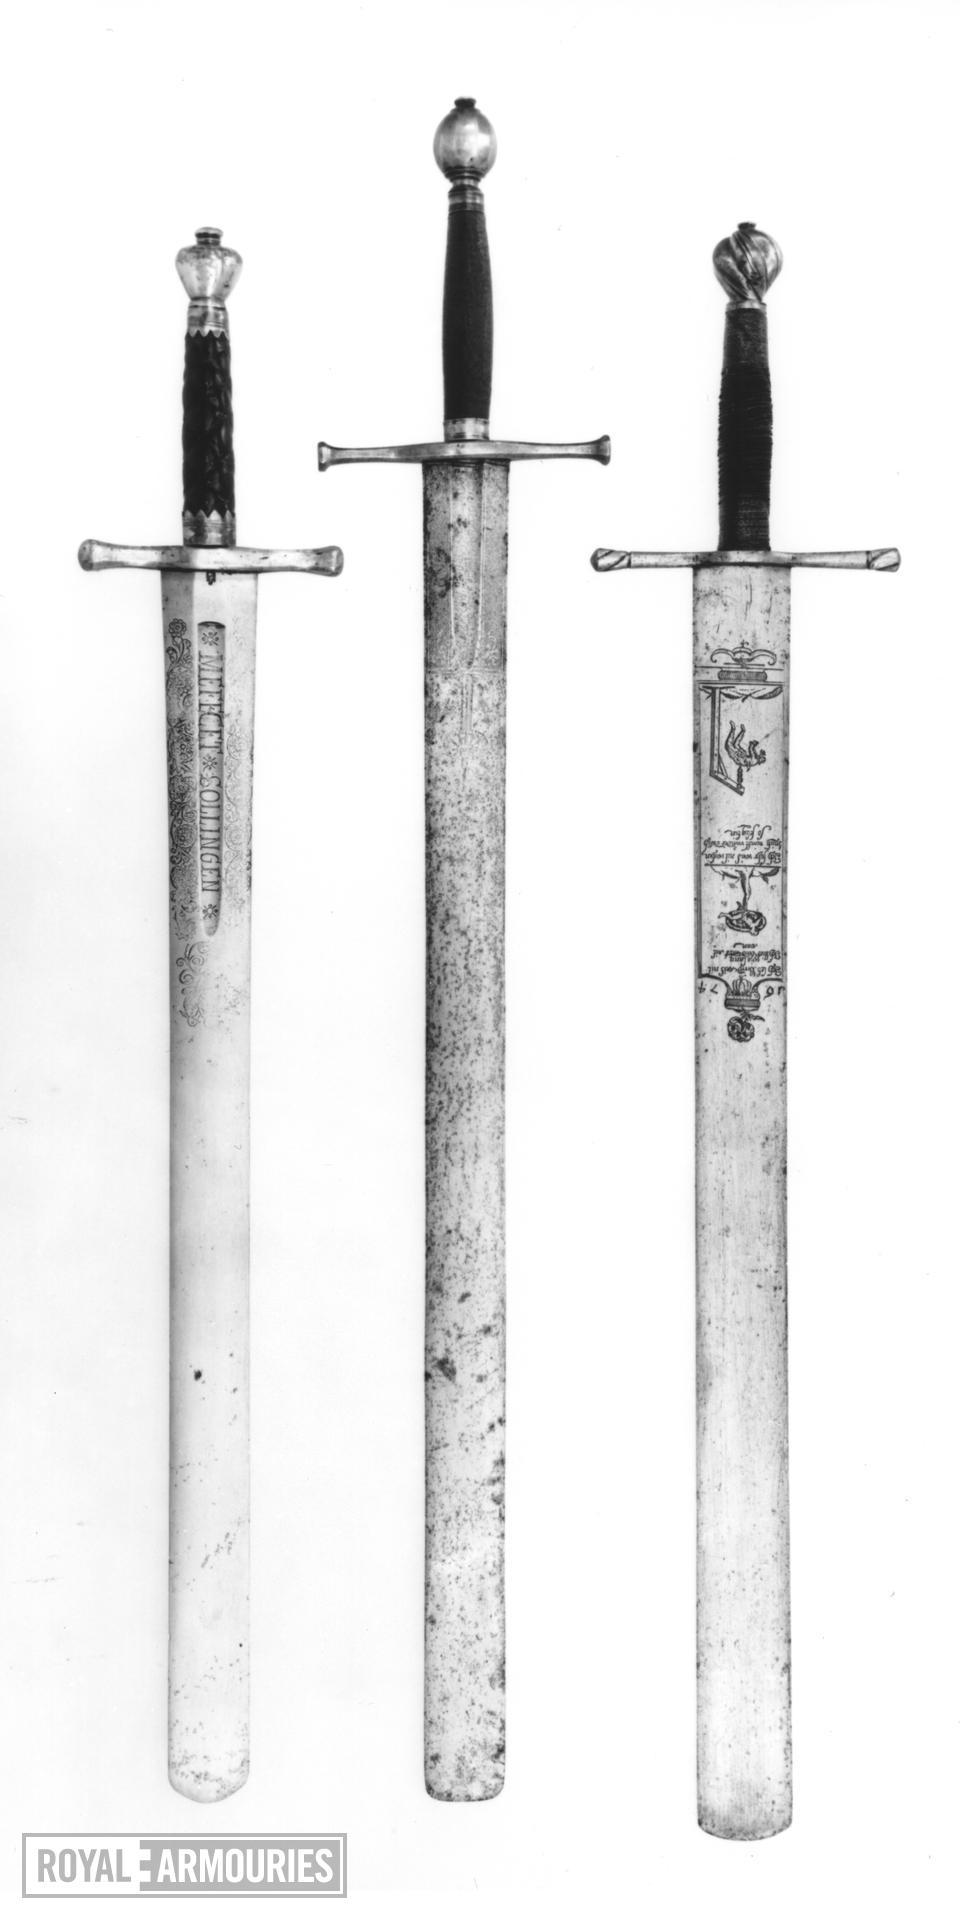 Sword - Executioner's sword with broad balde terminating in blunt tip.